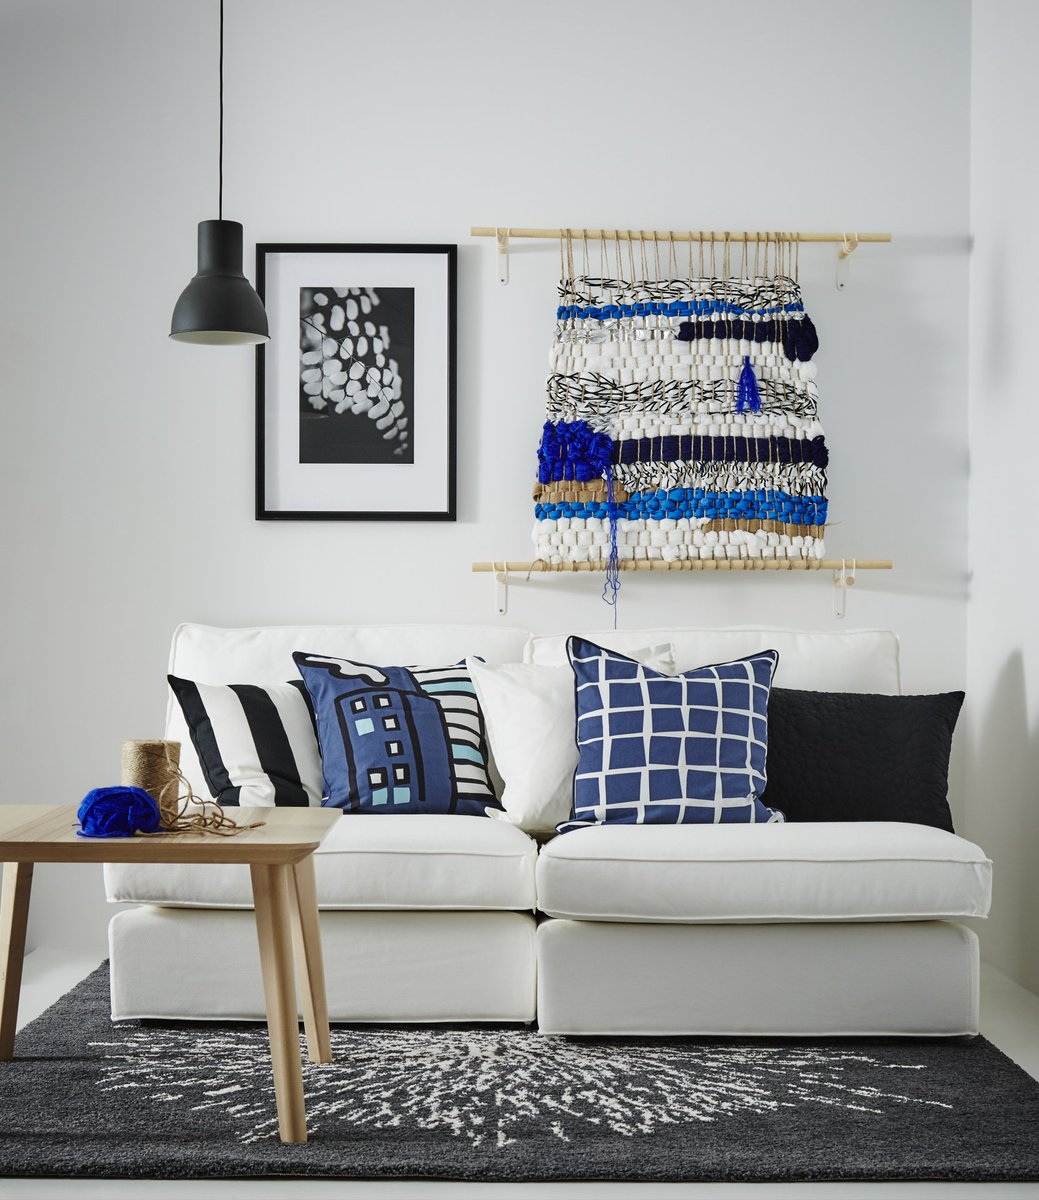 IKEA Italia (@IKEAITALIA) | Twitter - photo#3